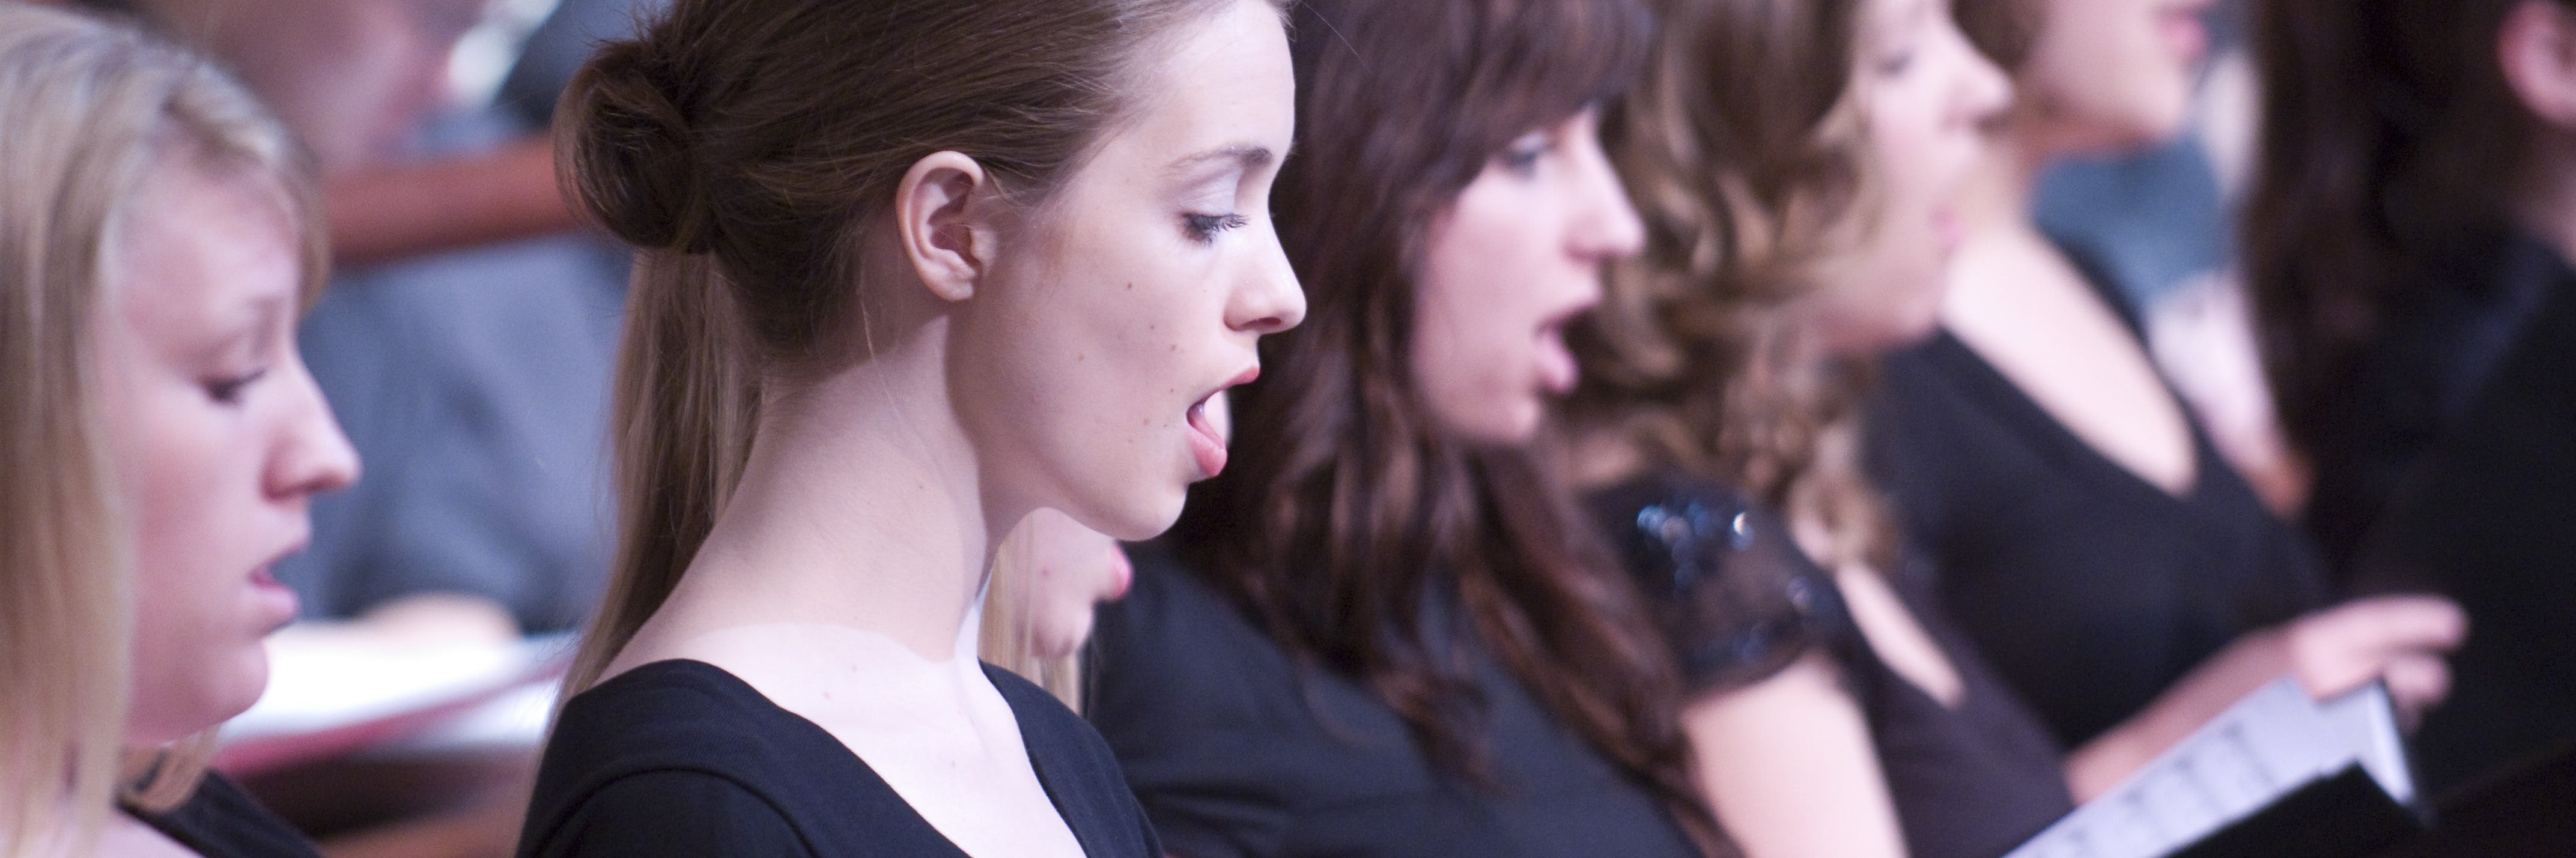 Students performing in choir